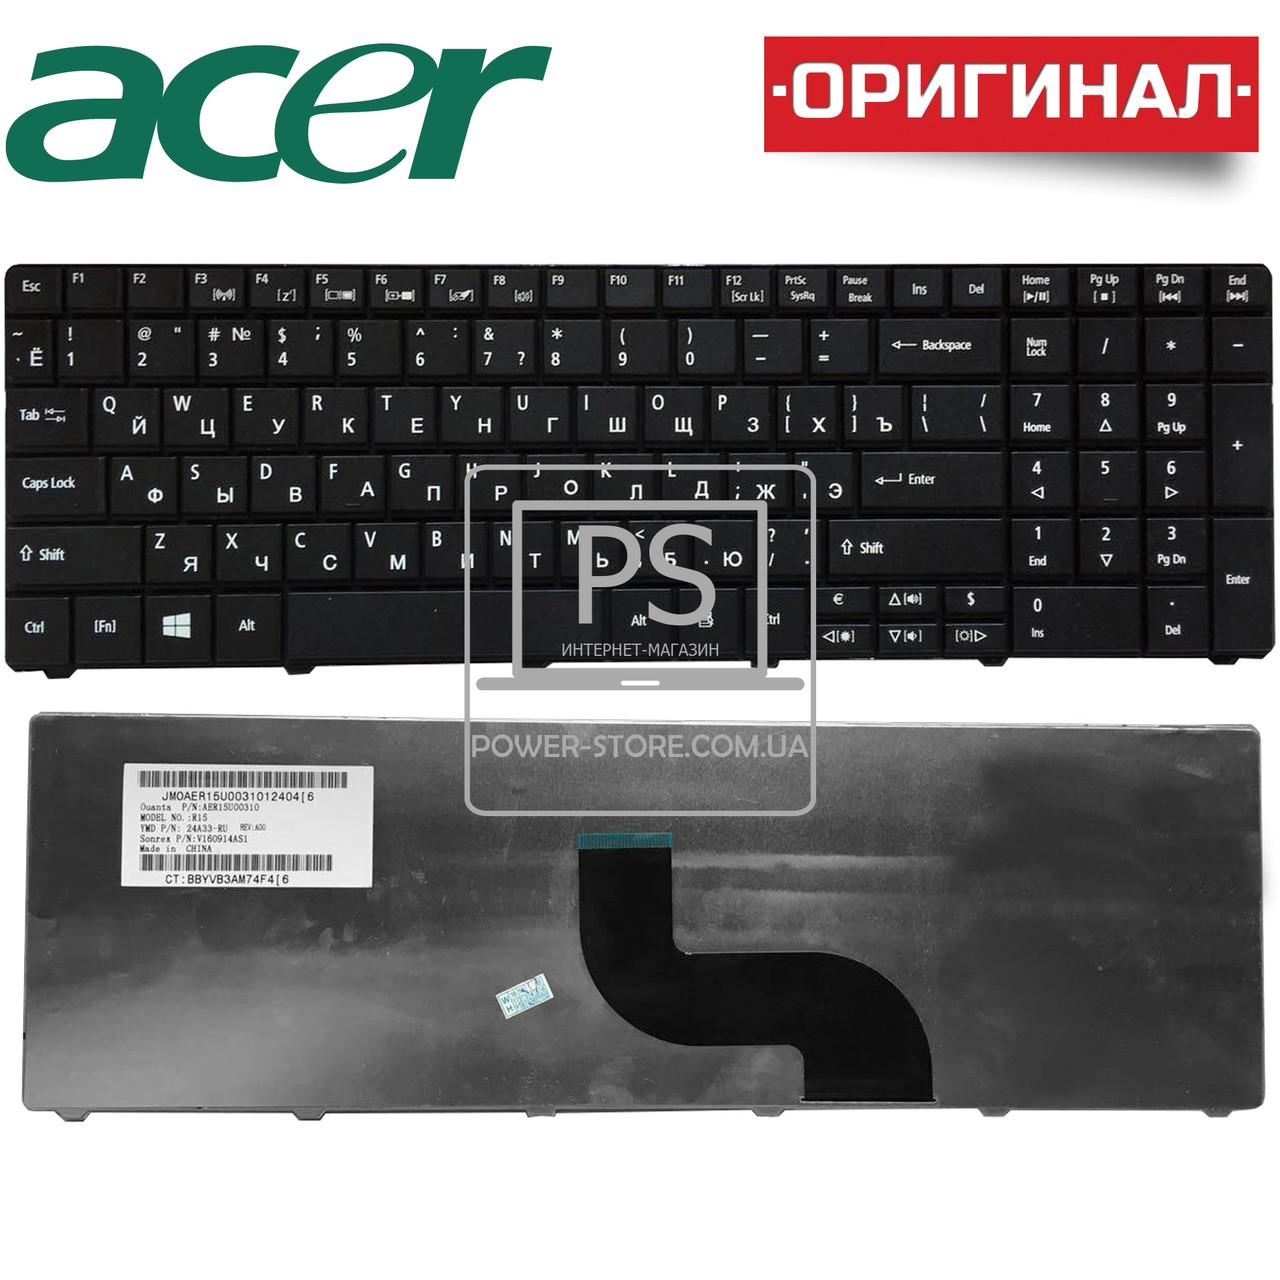 Клавиатура  для ноутбука ACER KB.I170A.092, KB.I170A.093, KB.I170A.094, KB.I170A.095,